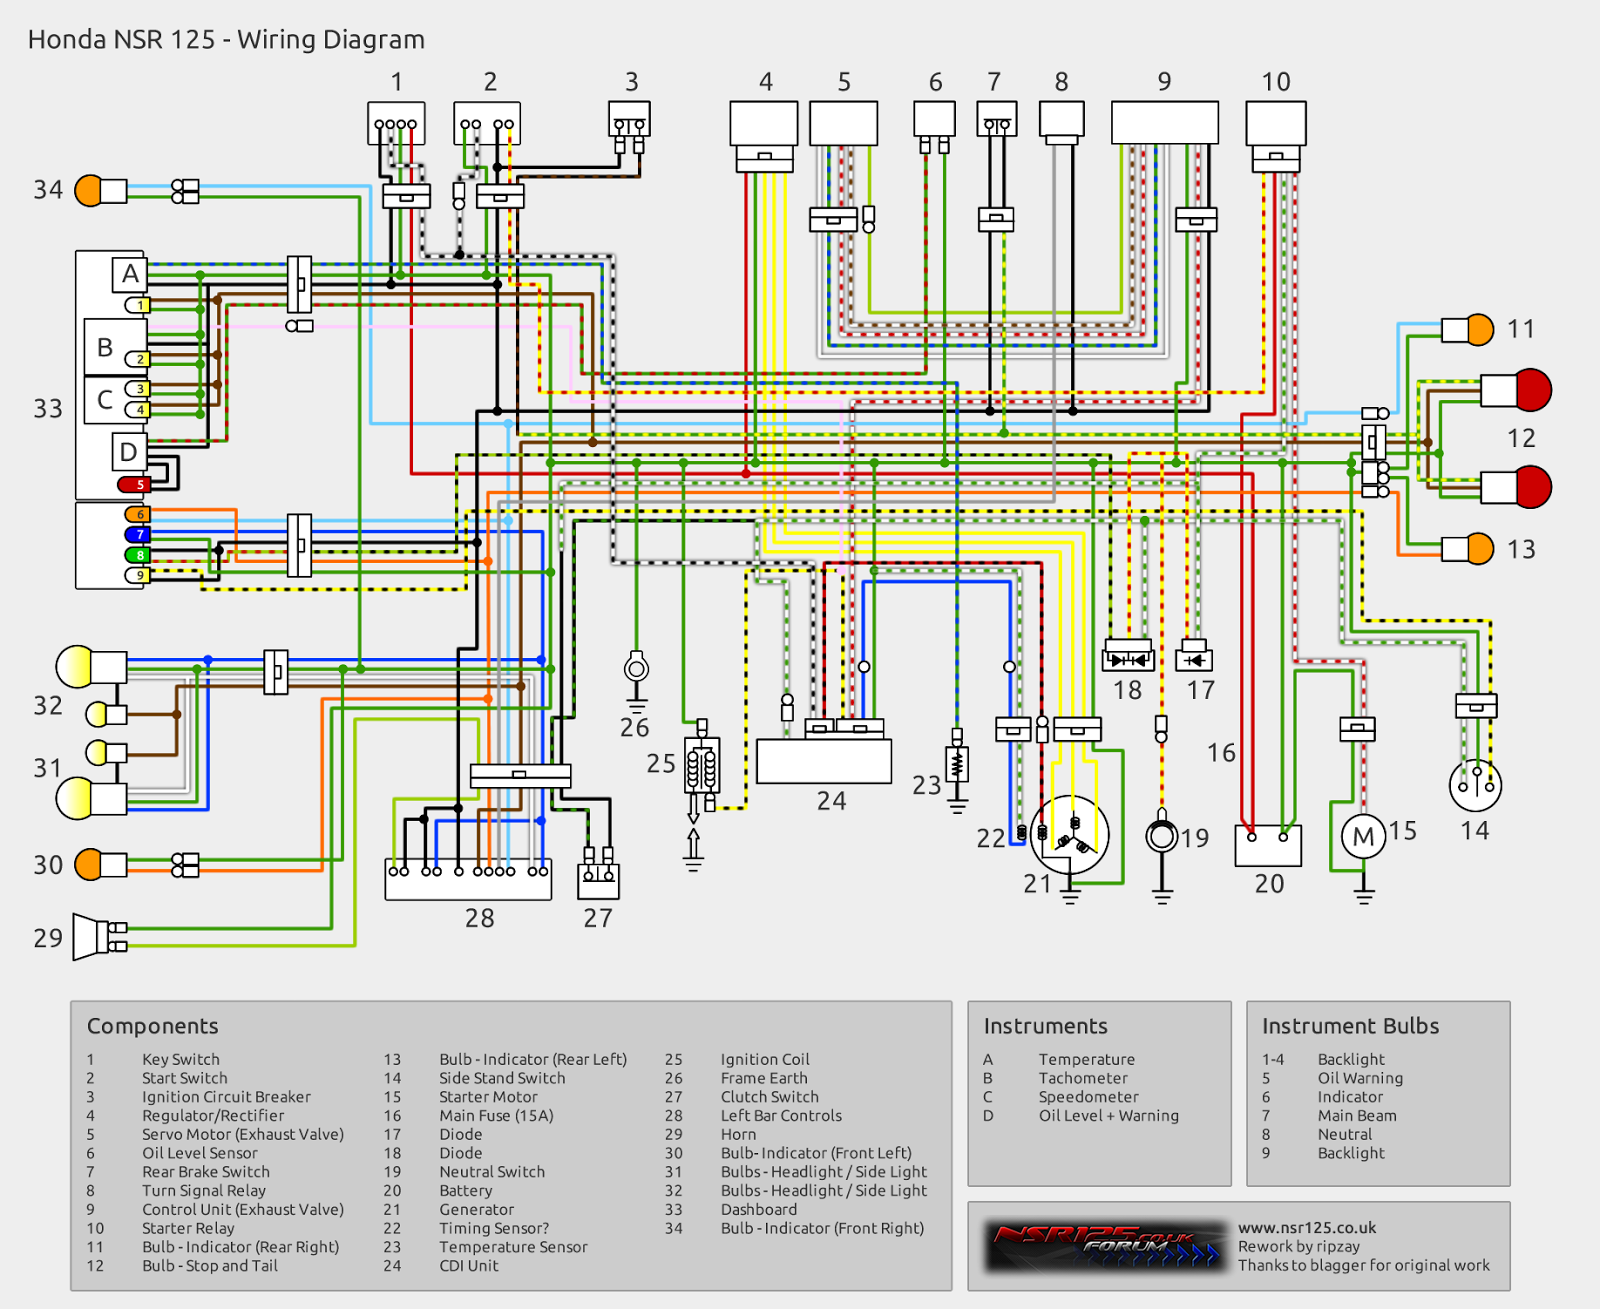 medium resolution of nsr salatiga wiring diagram honda nsr series rh nsrsalatiga blogspot com honda cbr1100xx honda cg125